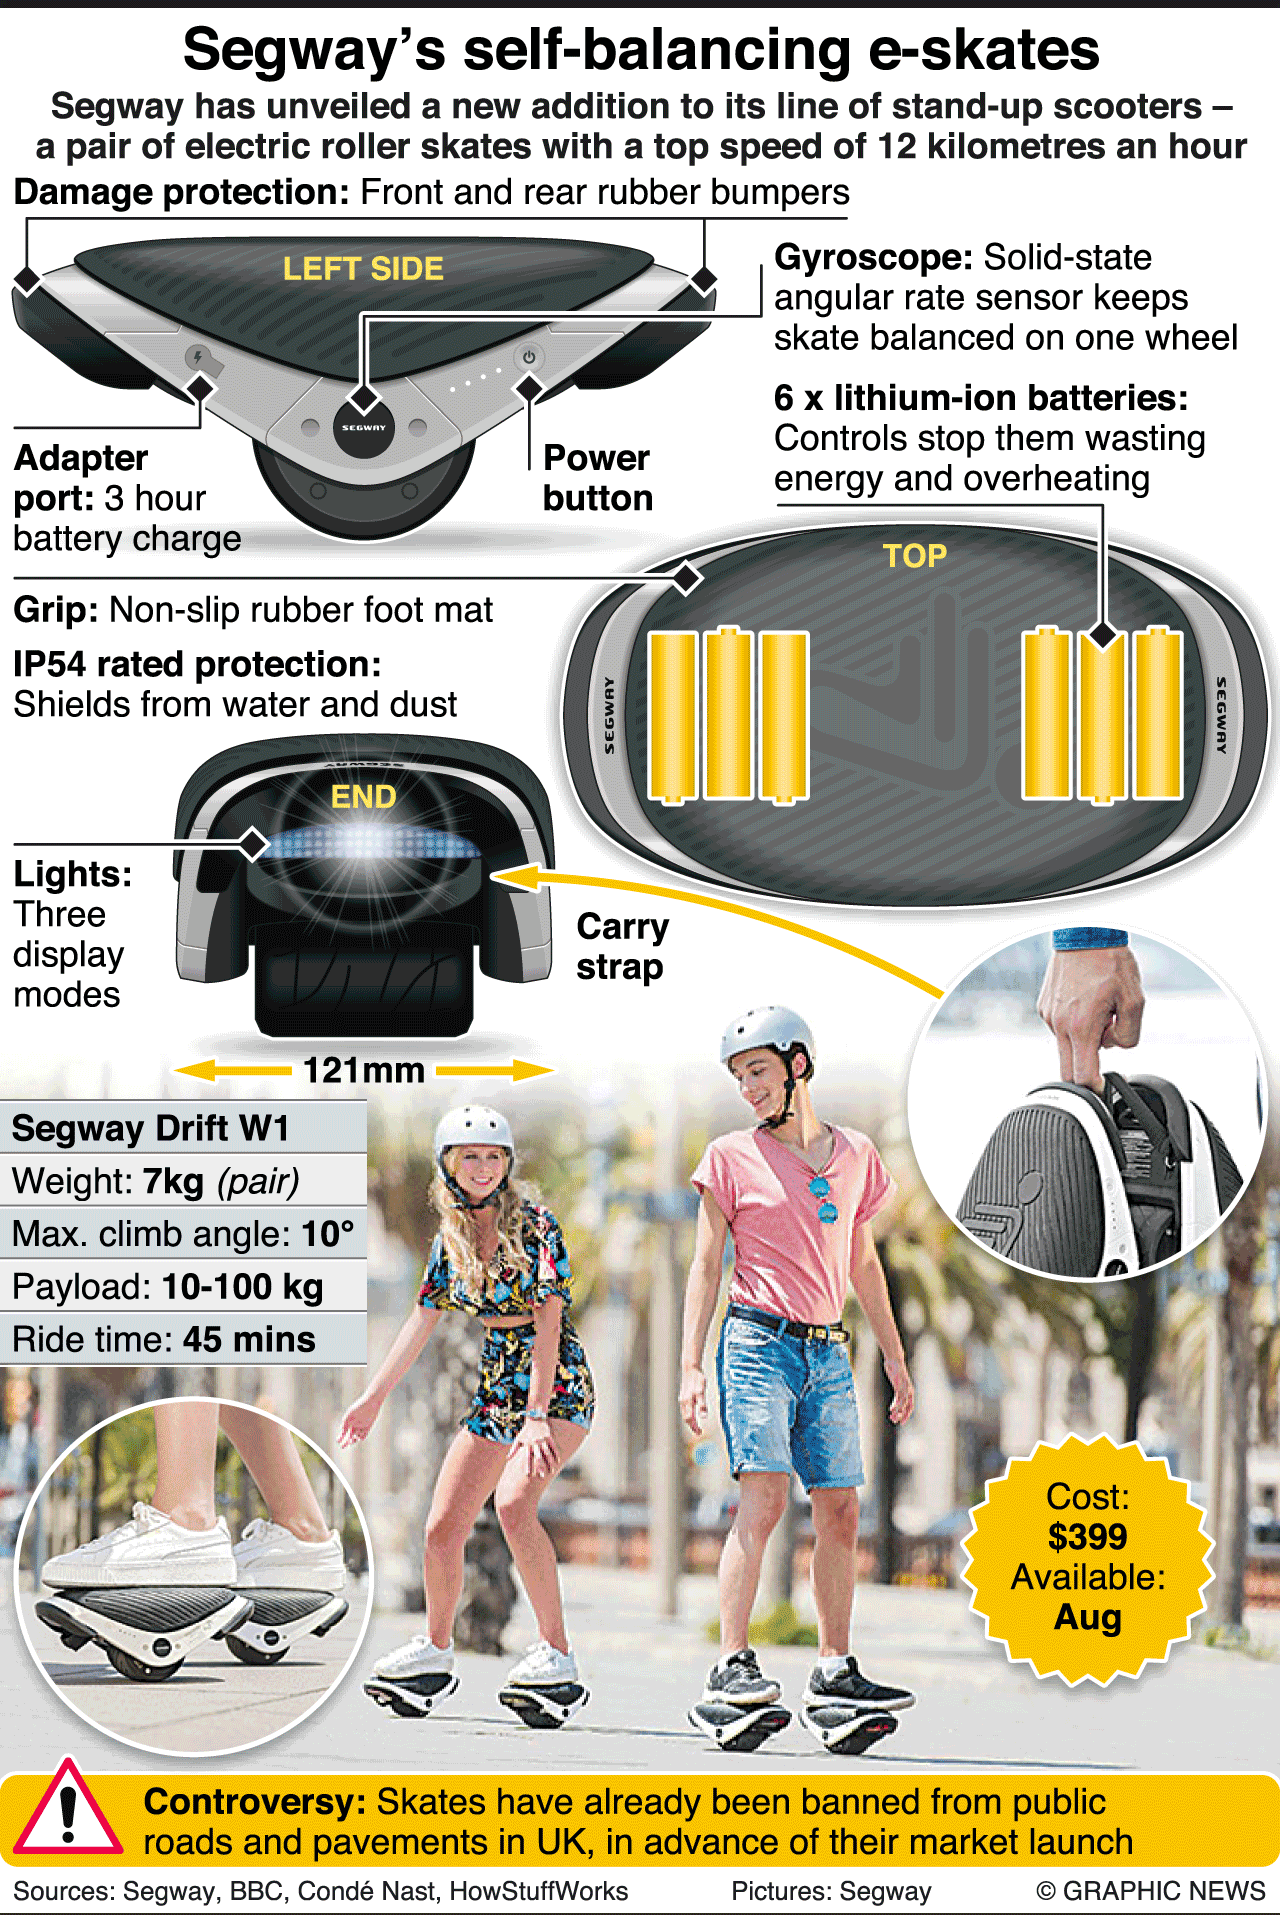 Segway's self-balancing e-skates